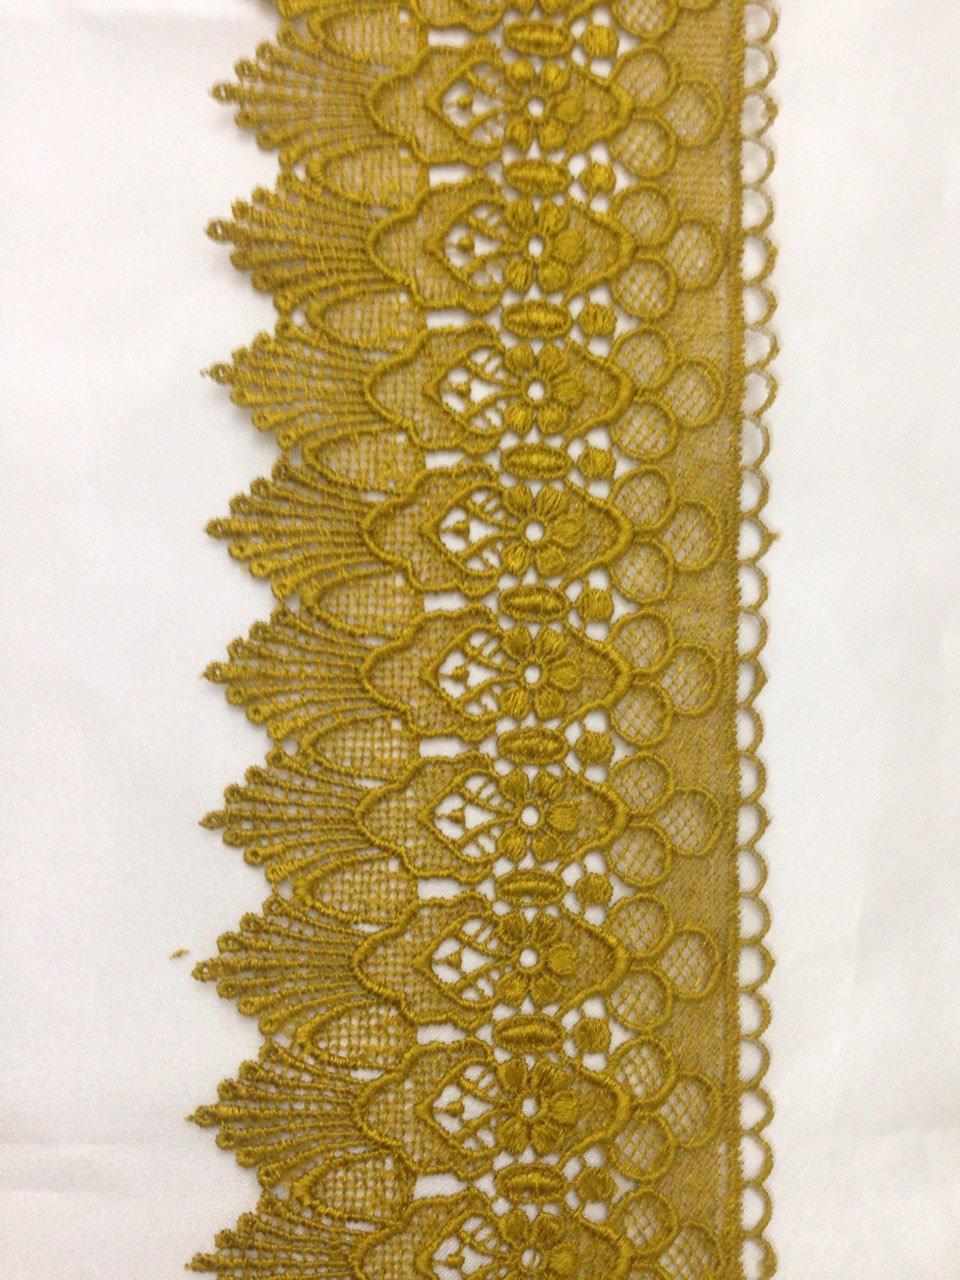 Mctrimmings MUSTARD GOLD BEAUTIFUL GUIPURE LACE TRIM EDGING Wedding Border 3.75 Inch//9.5 cm X 1 Yard